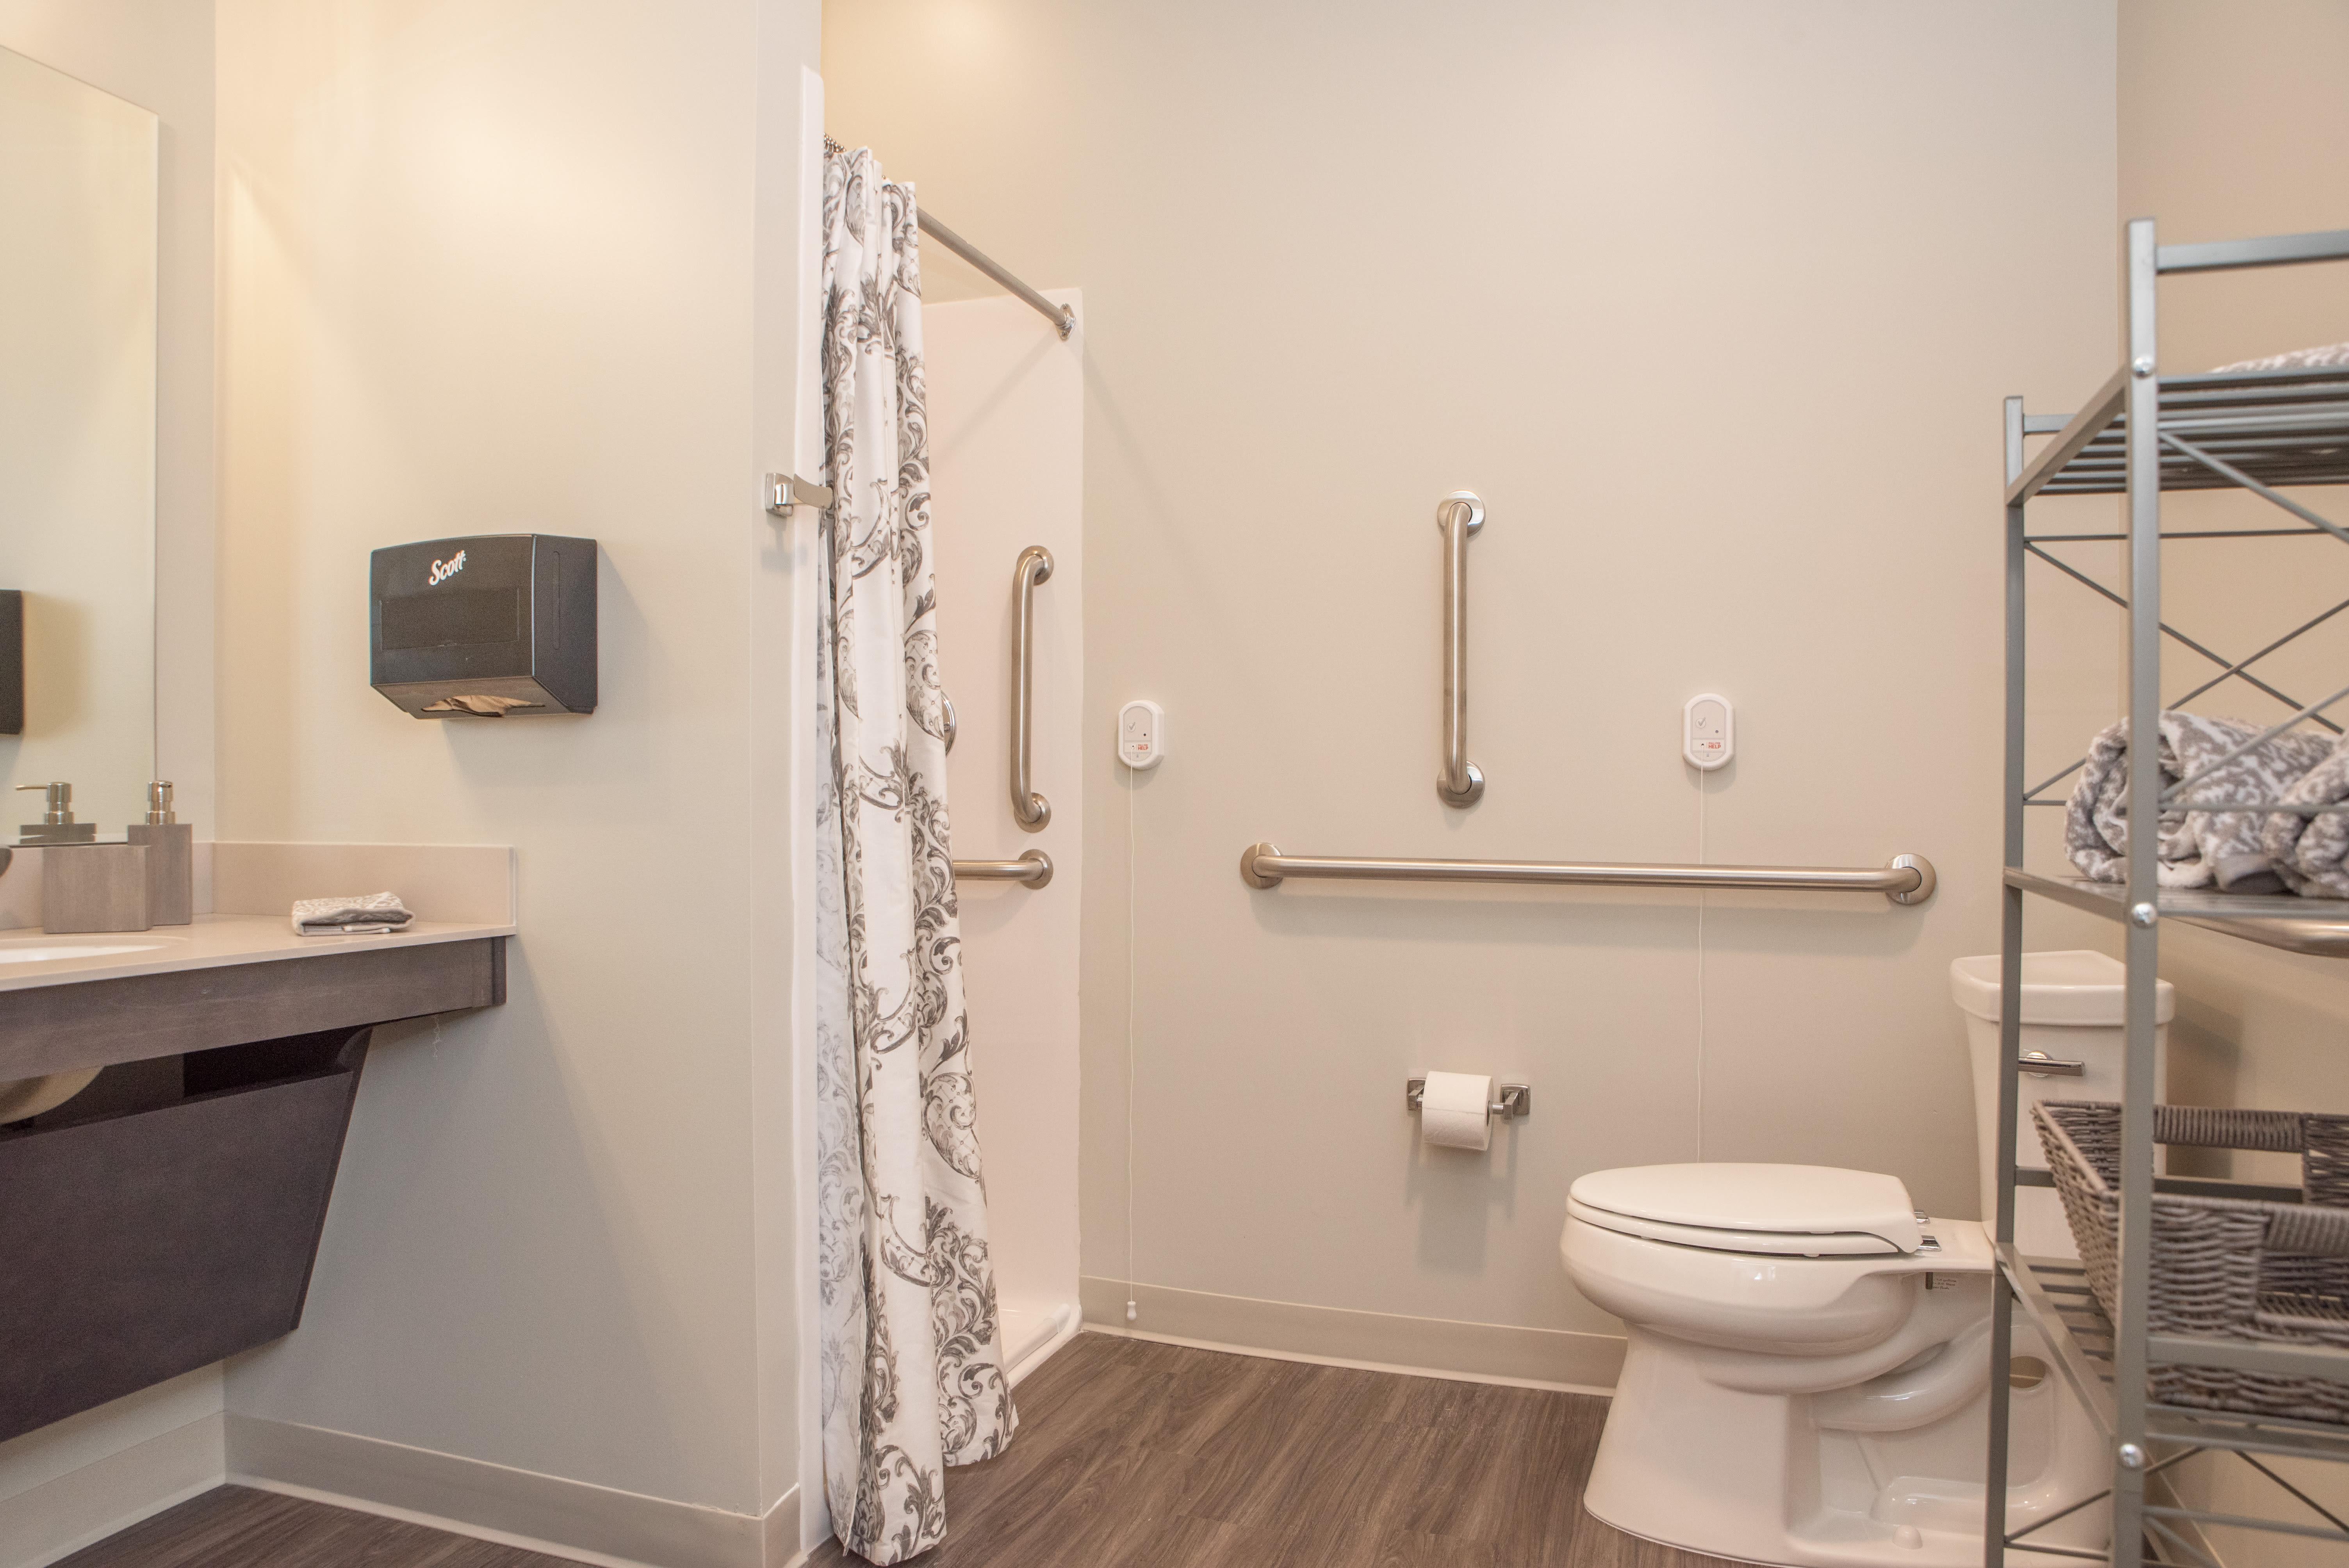 Bathroom at Cooper Trail Senior Living in Bardstown, Kentucky